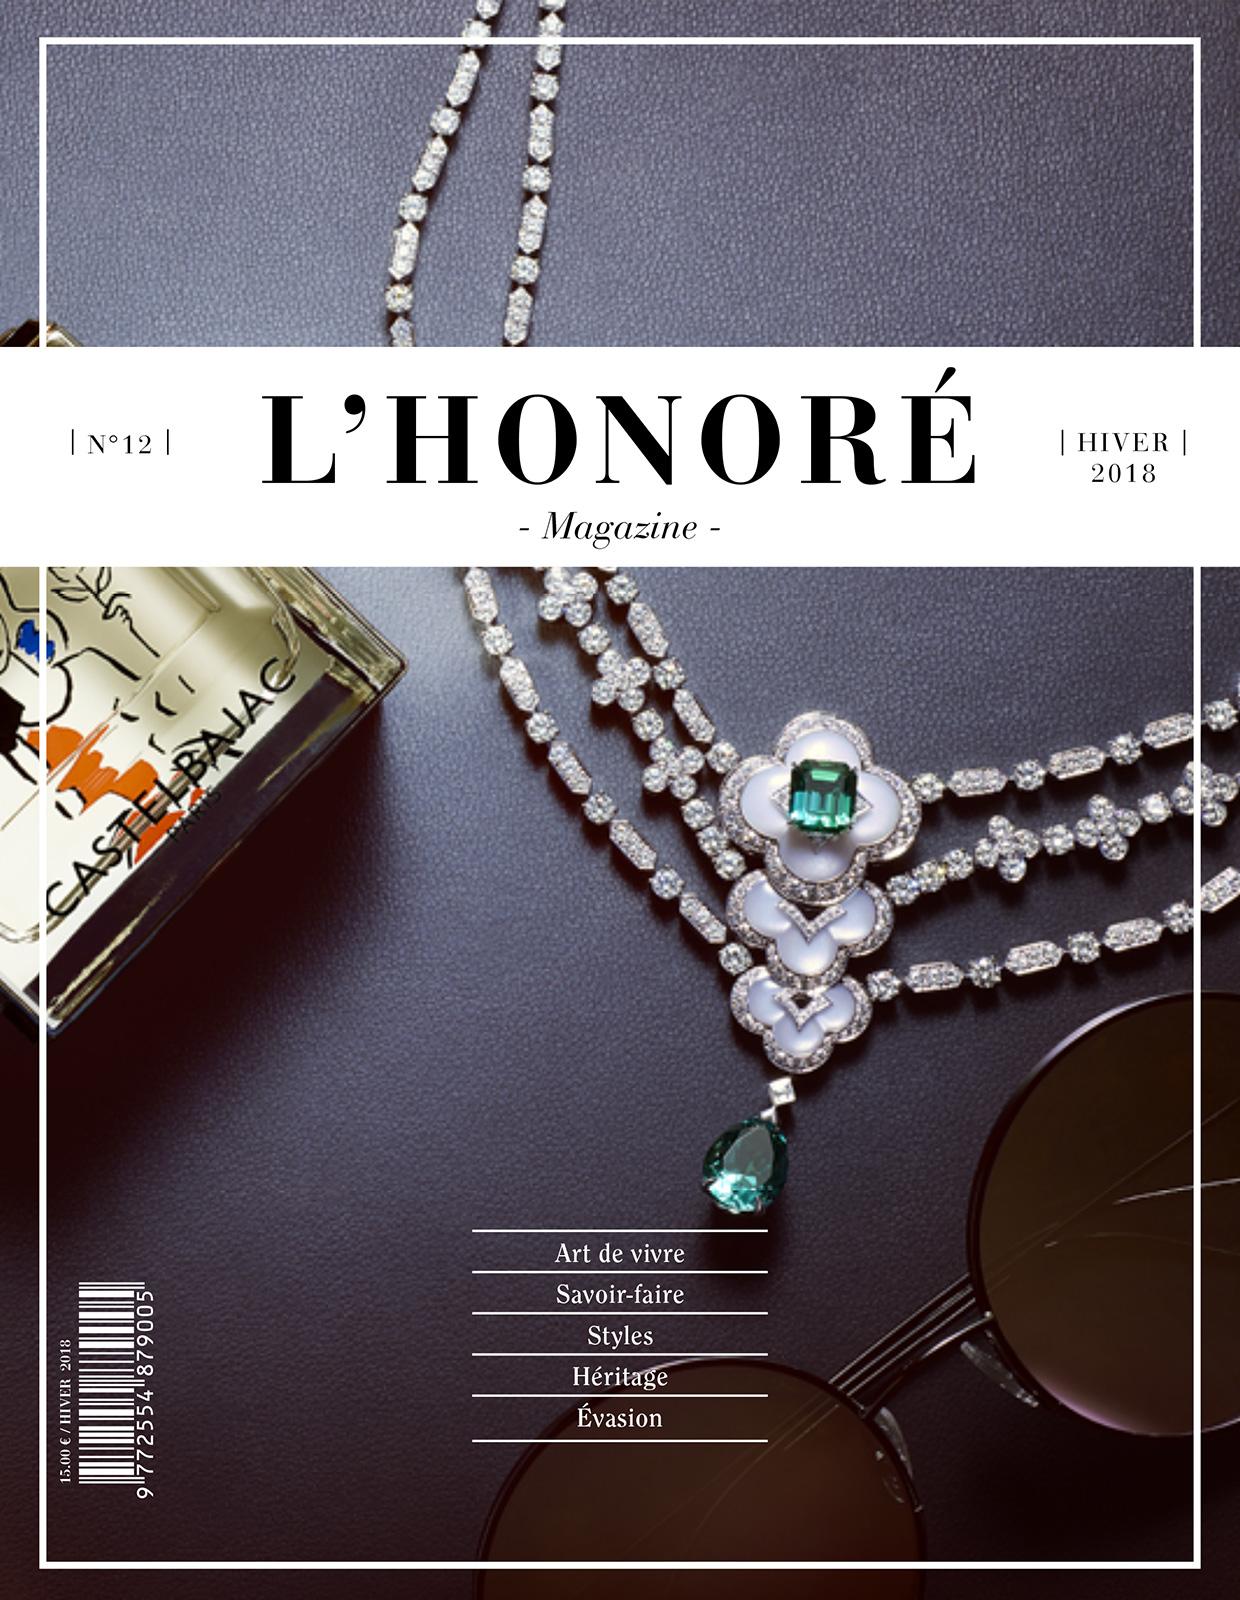 Honoré Magazine - Hiver 2018